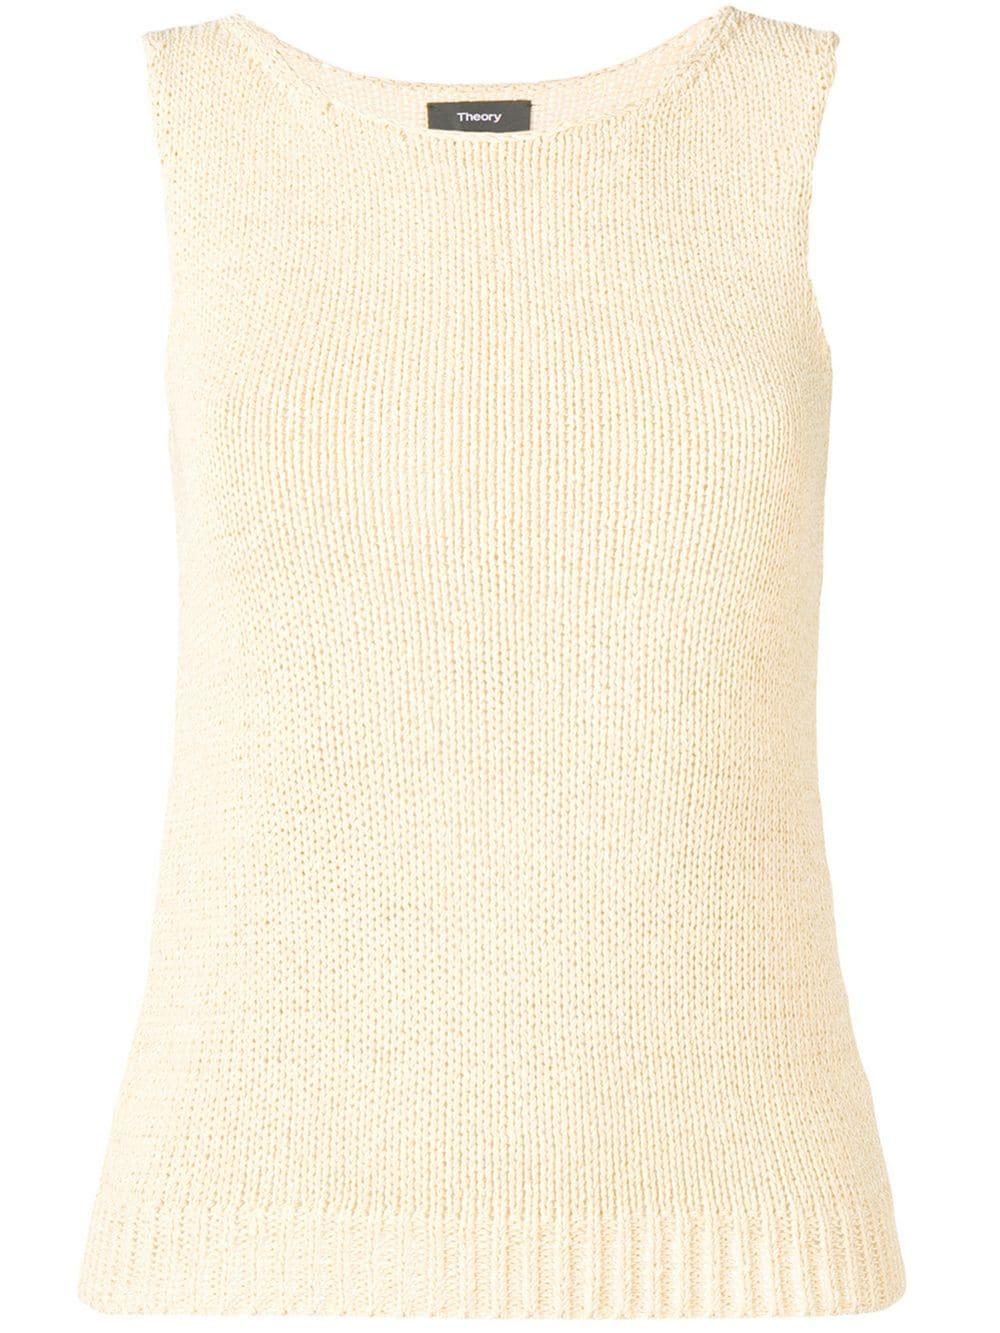 Sleeveless Knit Shell Sweater Item # J0214706